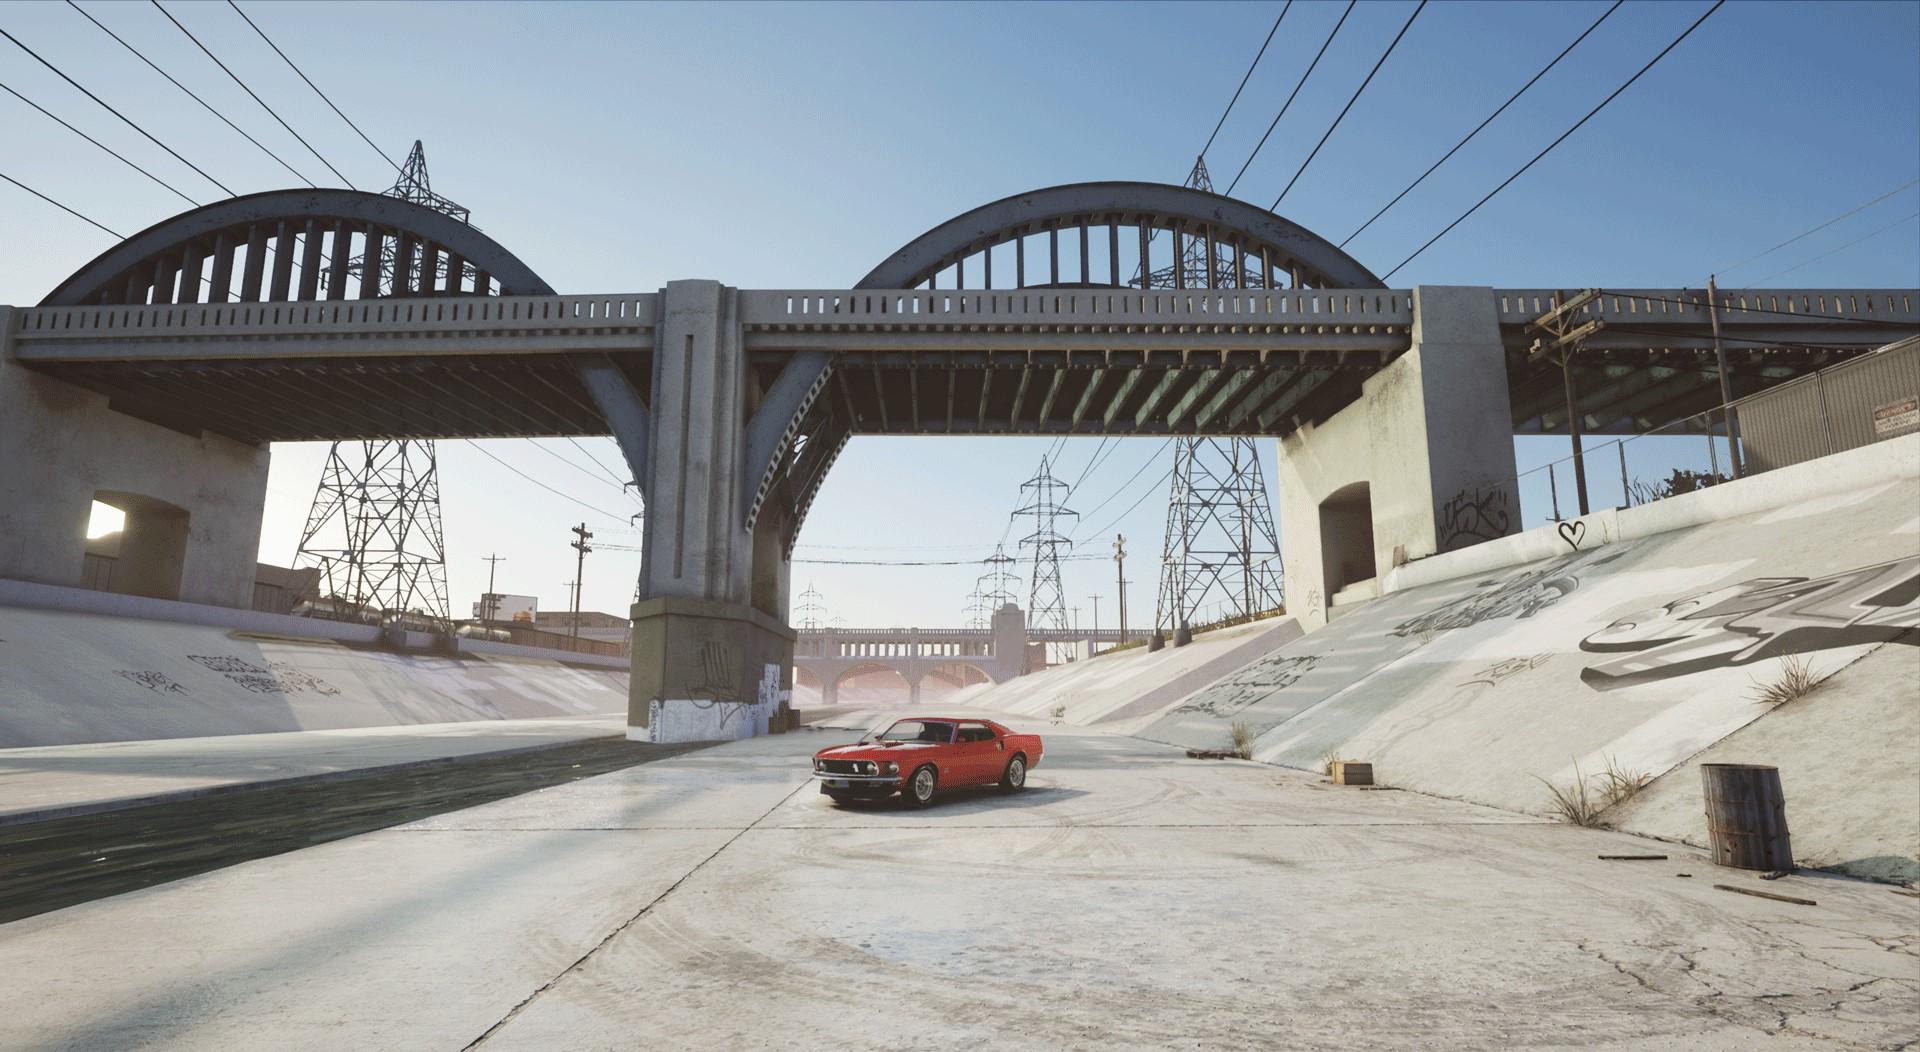 Scene in the Unreal Engine 4